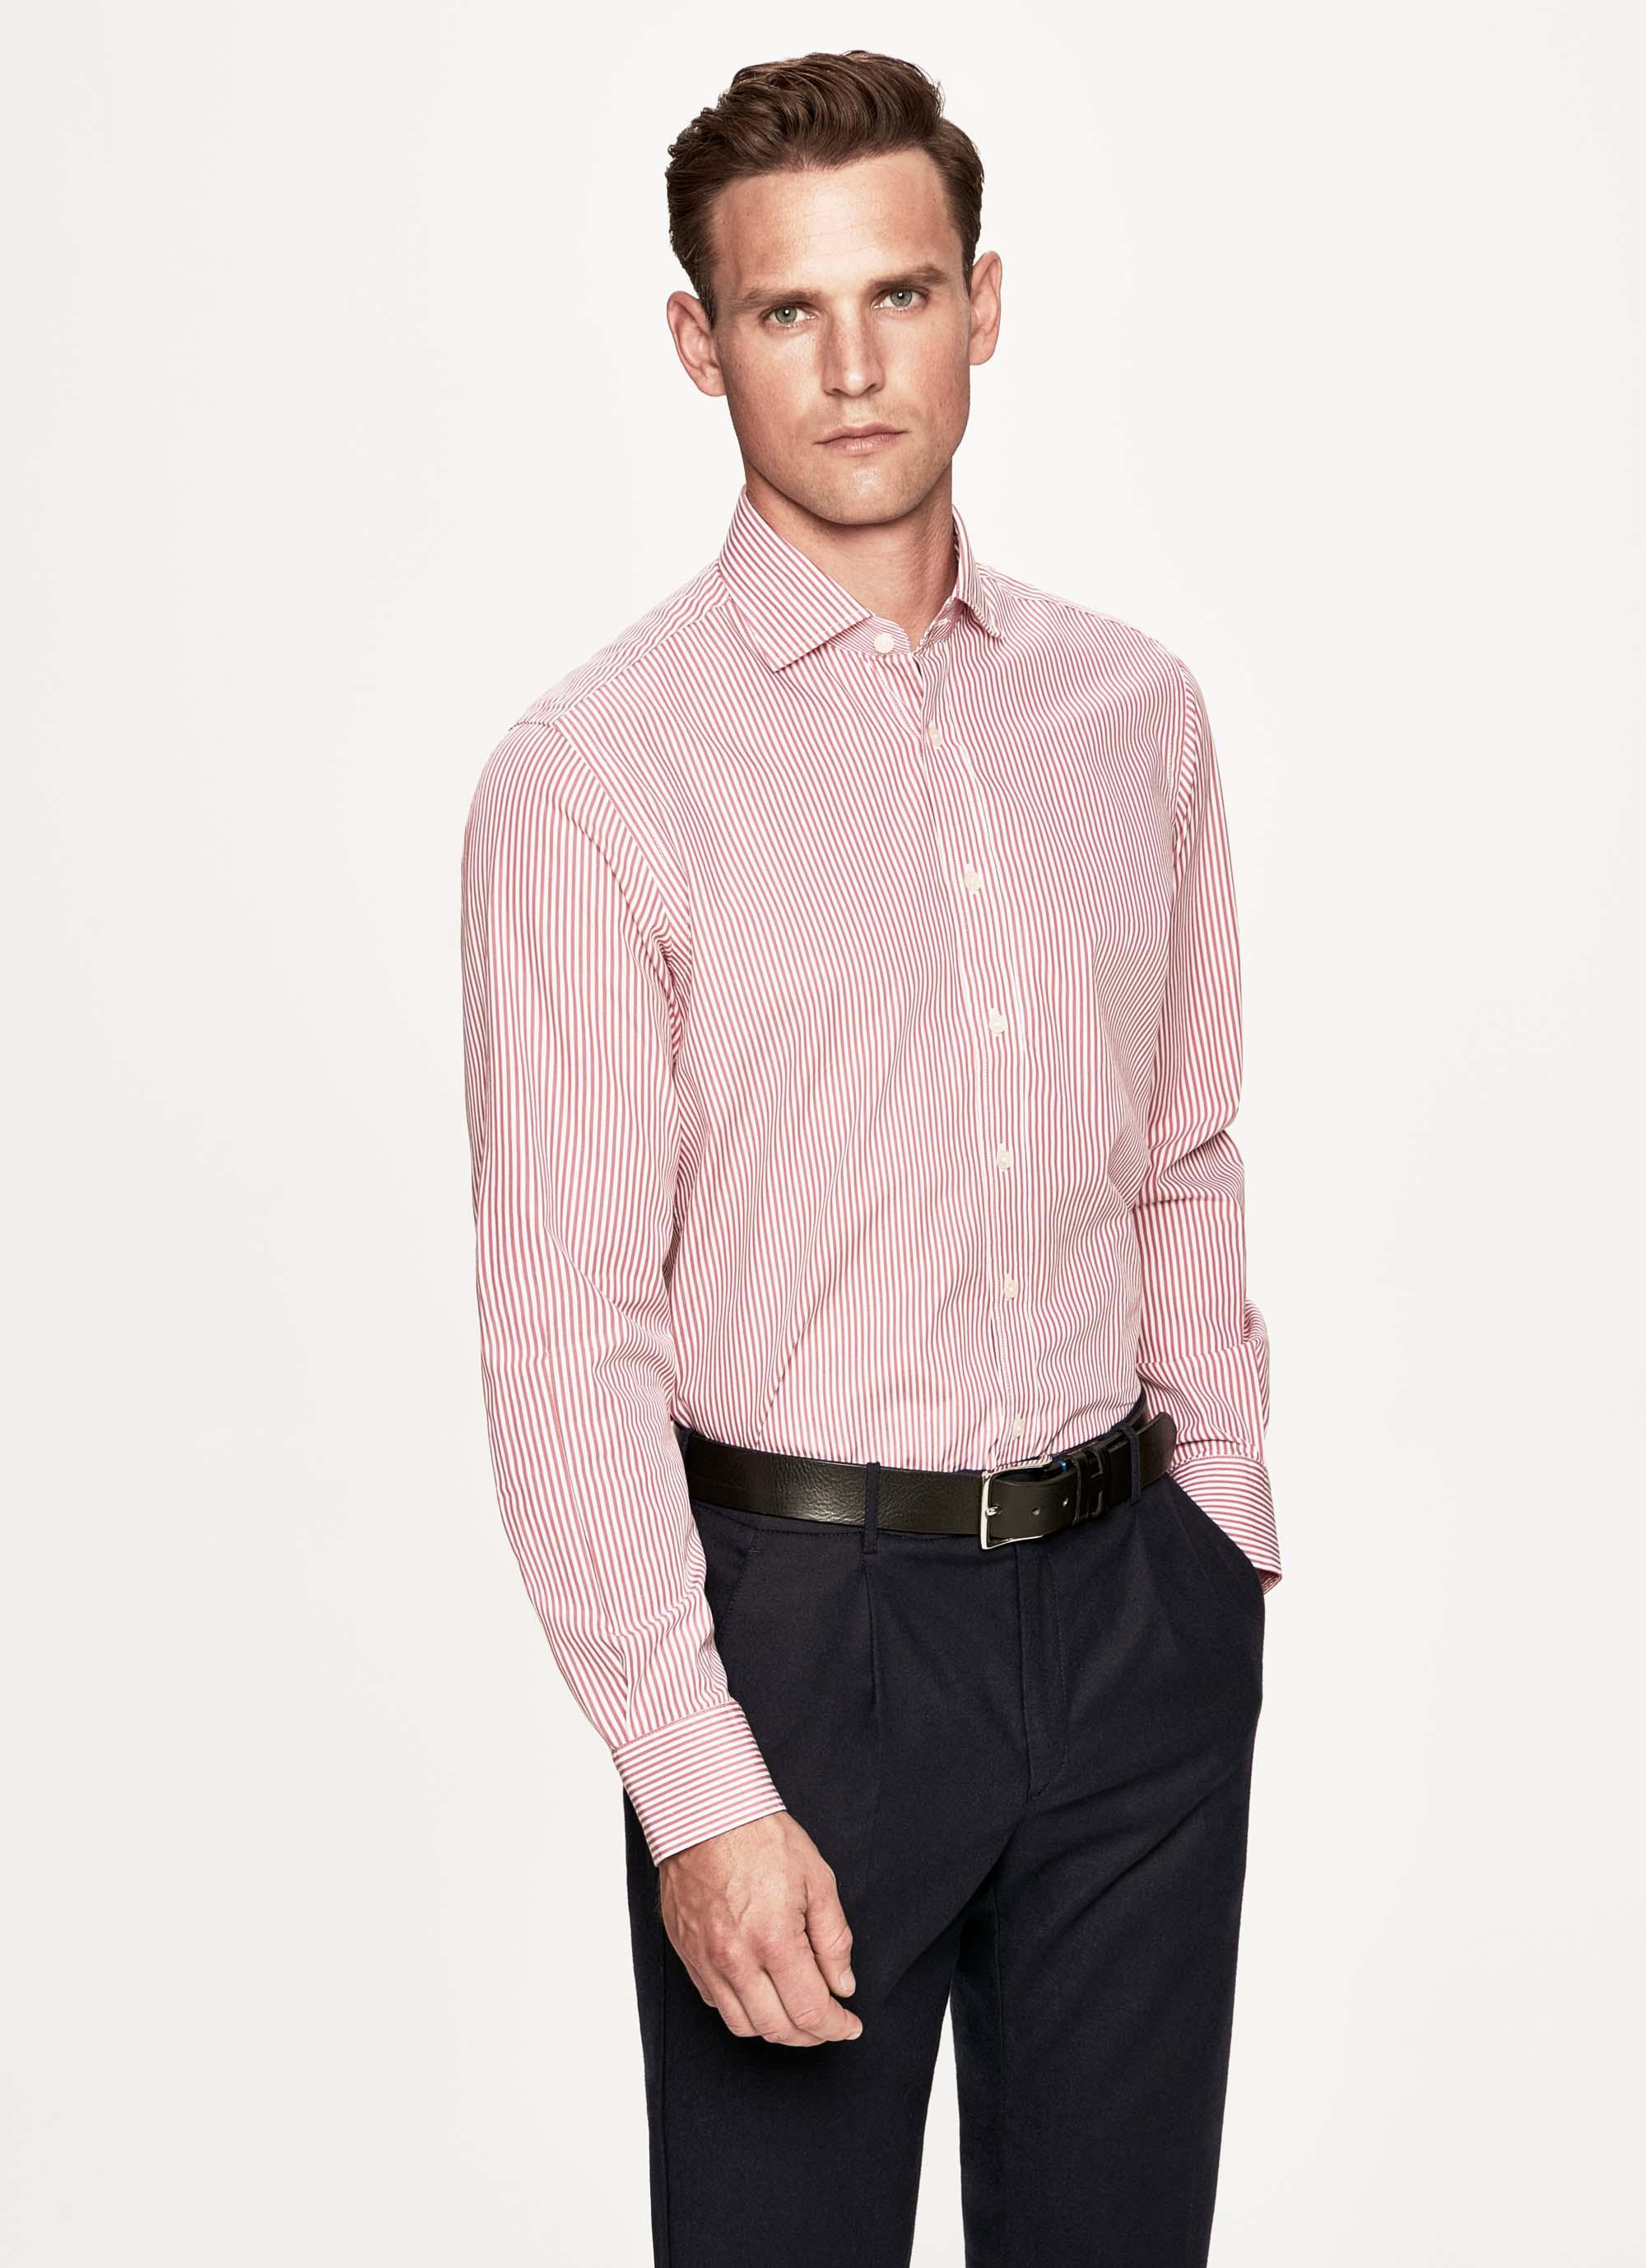 Hackett Skinny Bengal Stripe Cotton Shirt in Pink for Men - Lyst 9c3412c4b2700